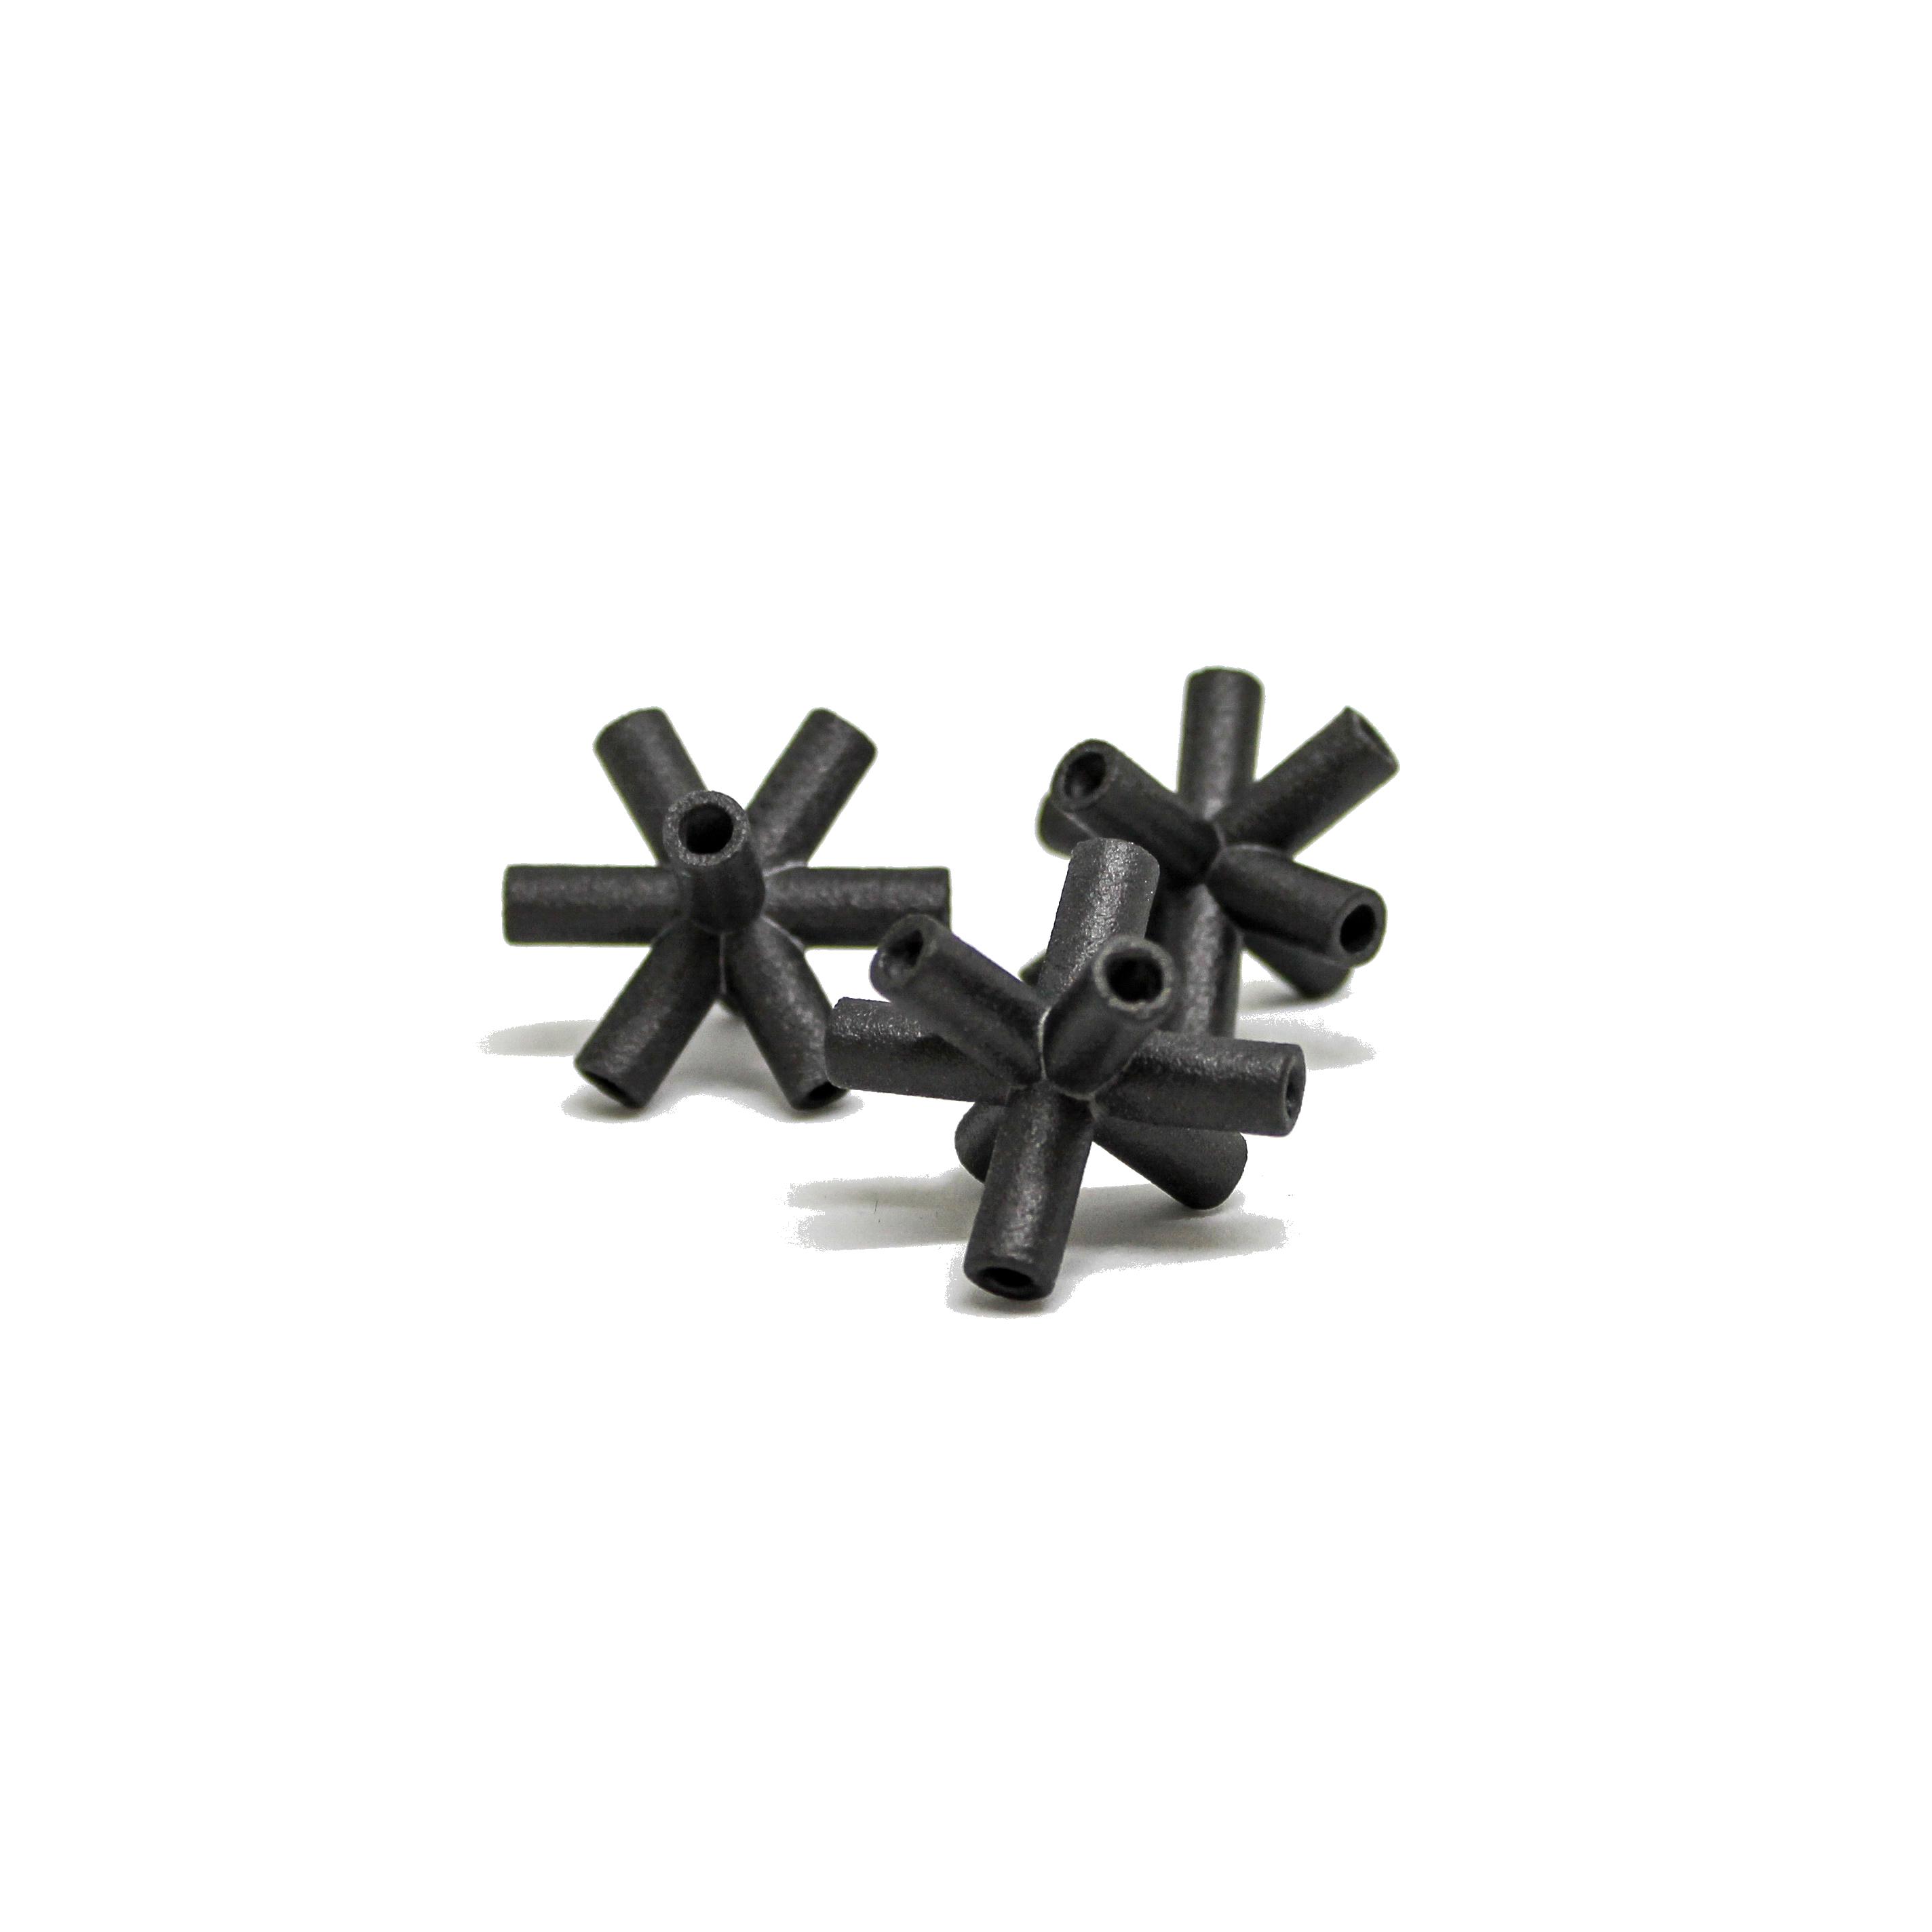 Makelab - 3D Printing Materials - Nylon MJF HP